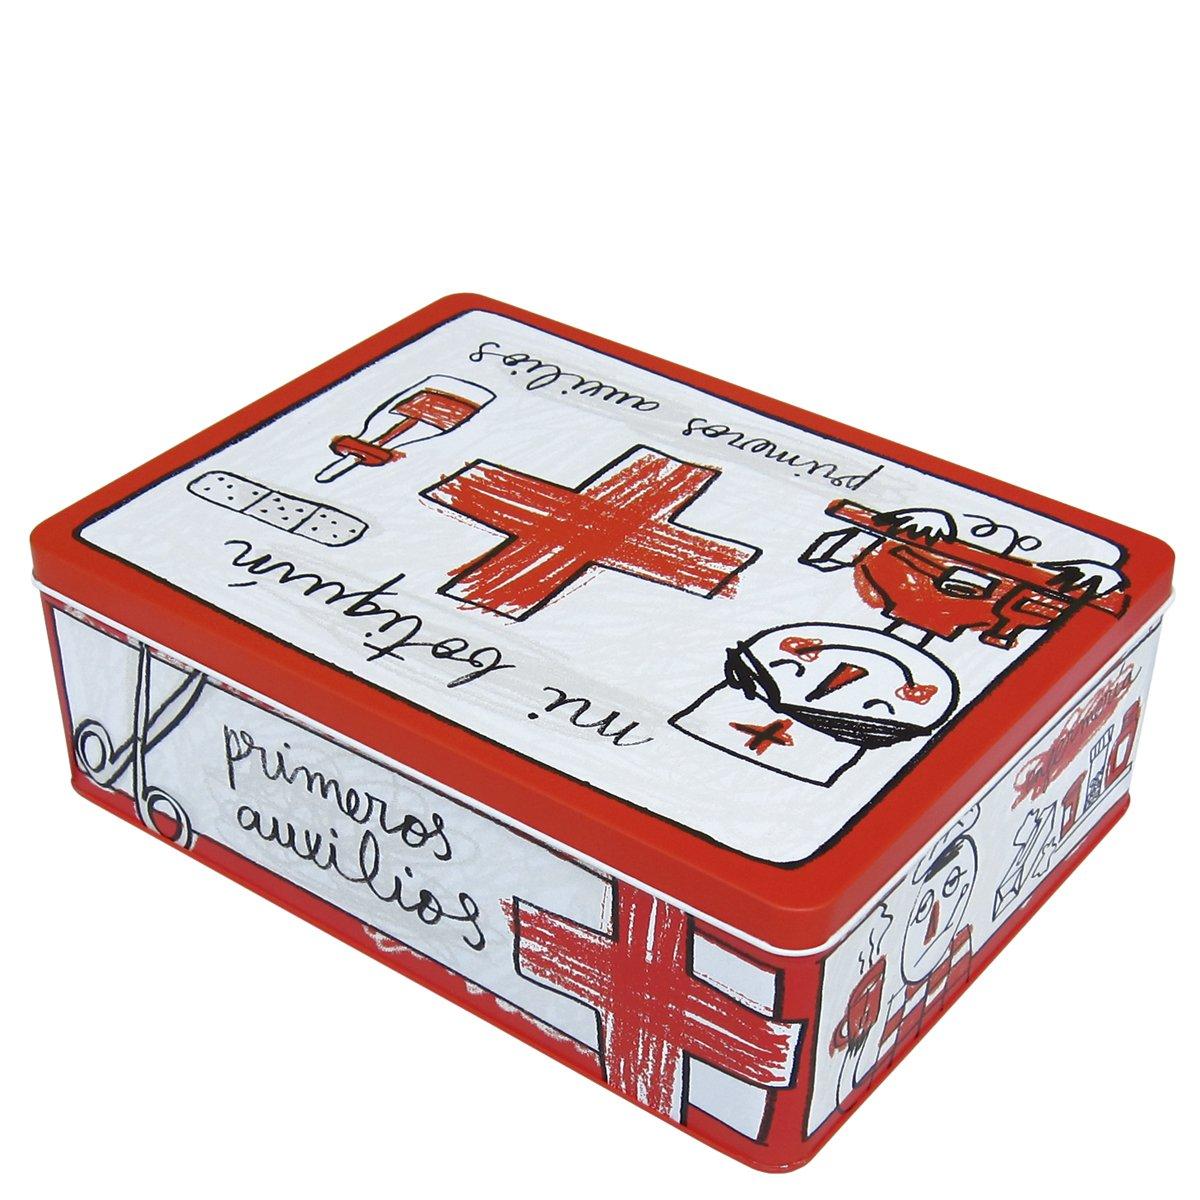 Laroom Caja metálica, Metal, Rojo, Blanco: Amazon.es: Hogar